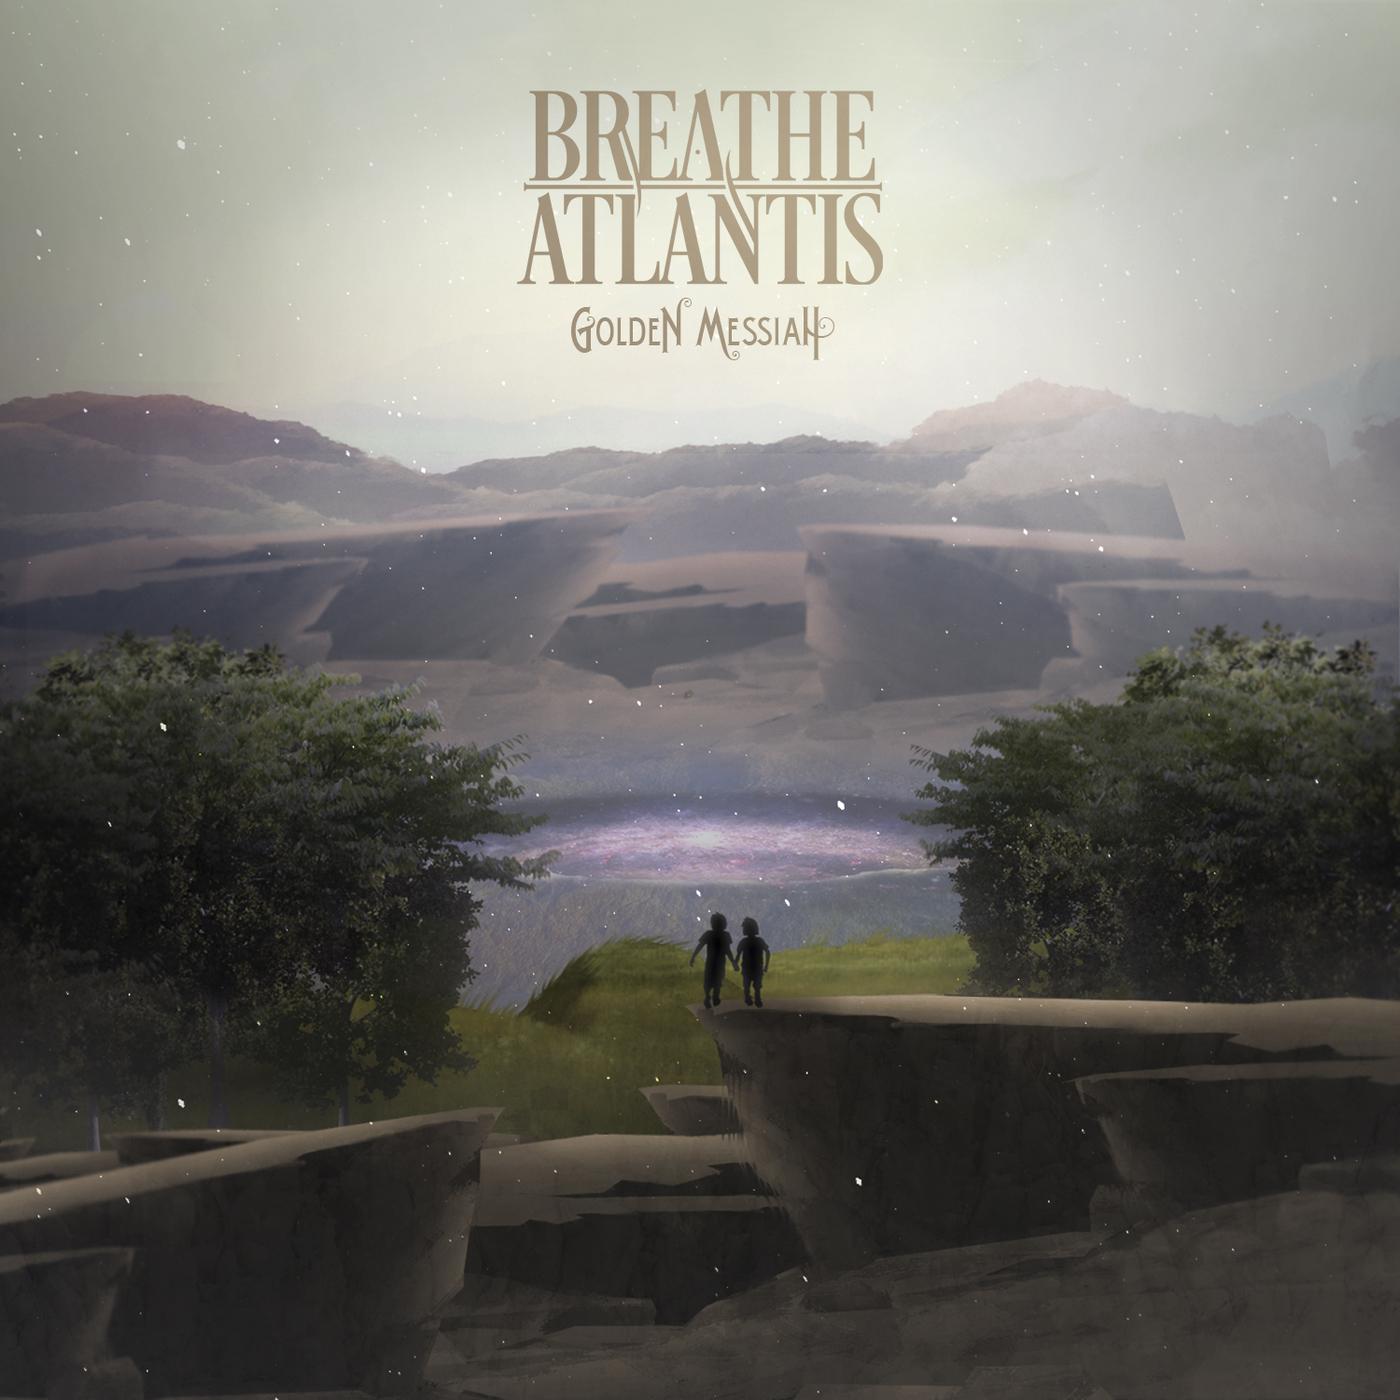 Breathe Atlantis - Golden Messiah [single] (2016)